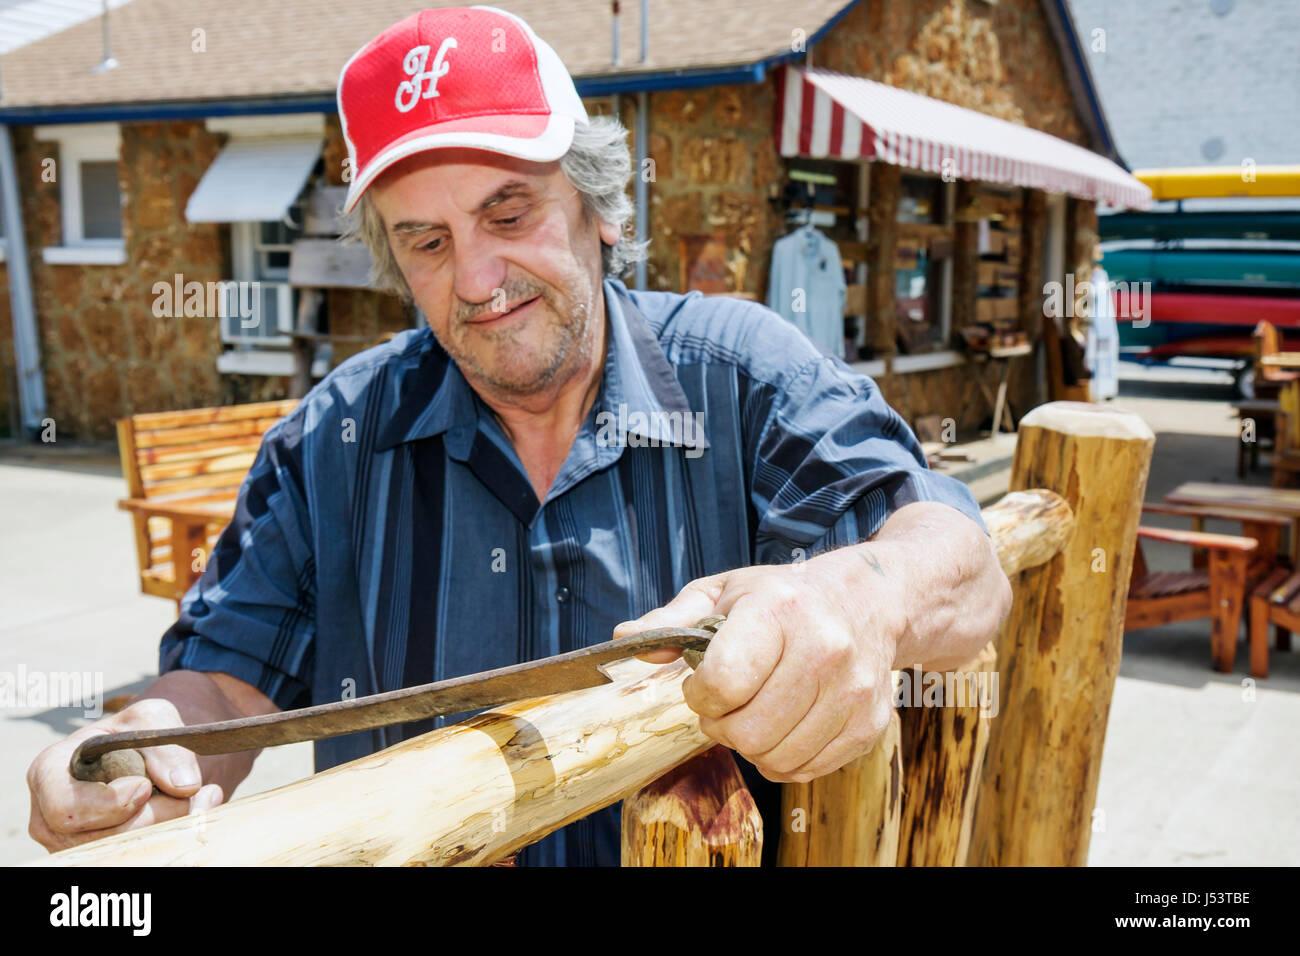 Arkansas Ozark Mountains Hardy Main Street The Indian Man Log Bed Headboard  Woodworker Rustic Furniture Man Craftsman Carpenter